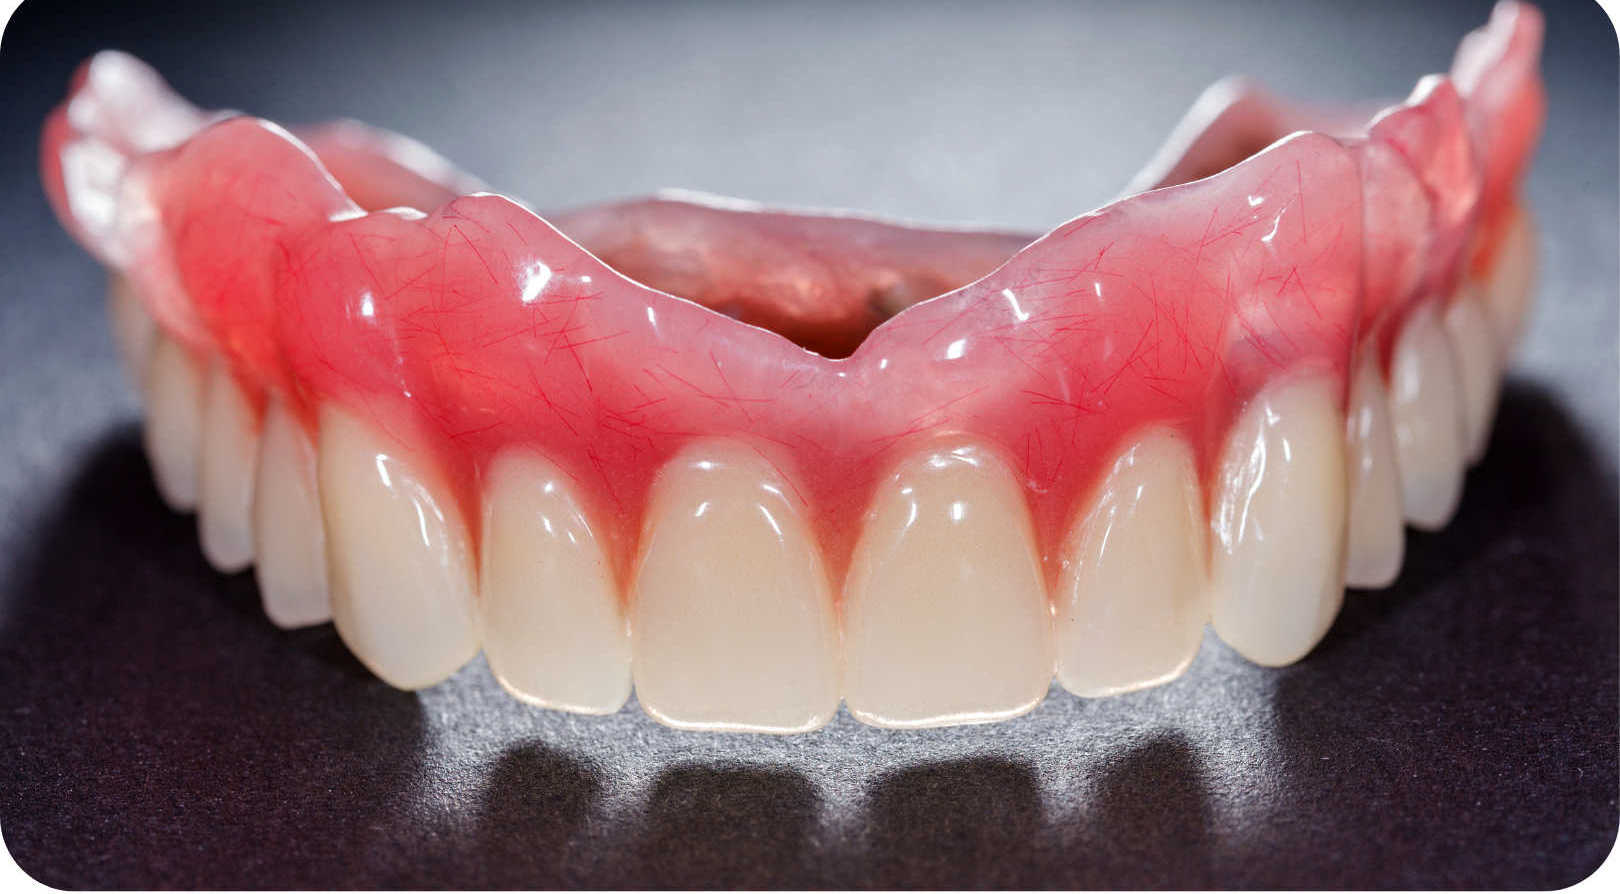 Dentures at St Clair Family Dental